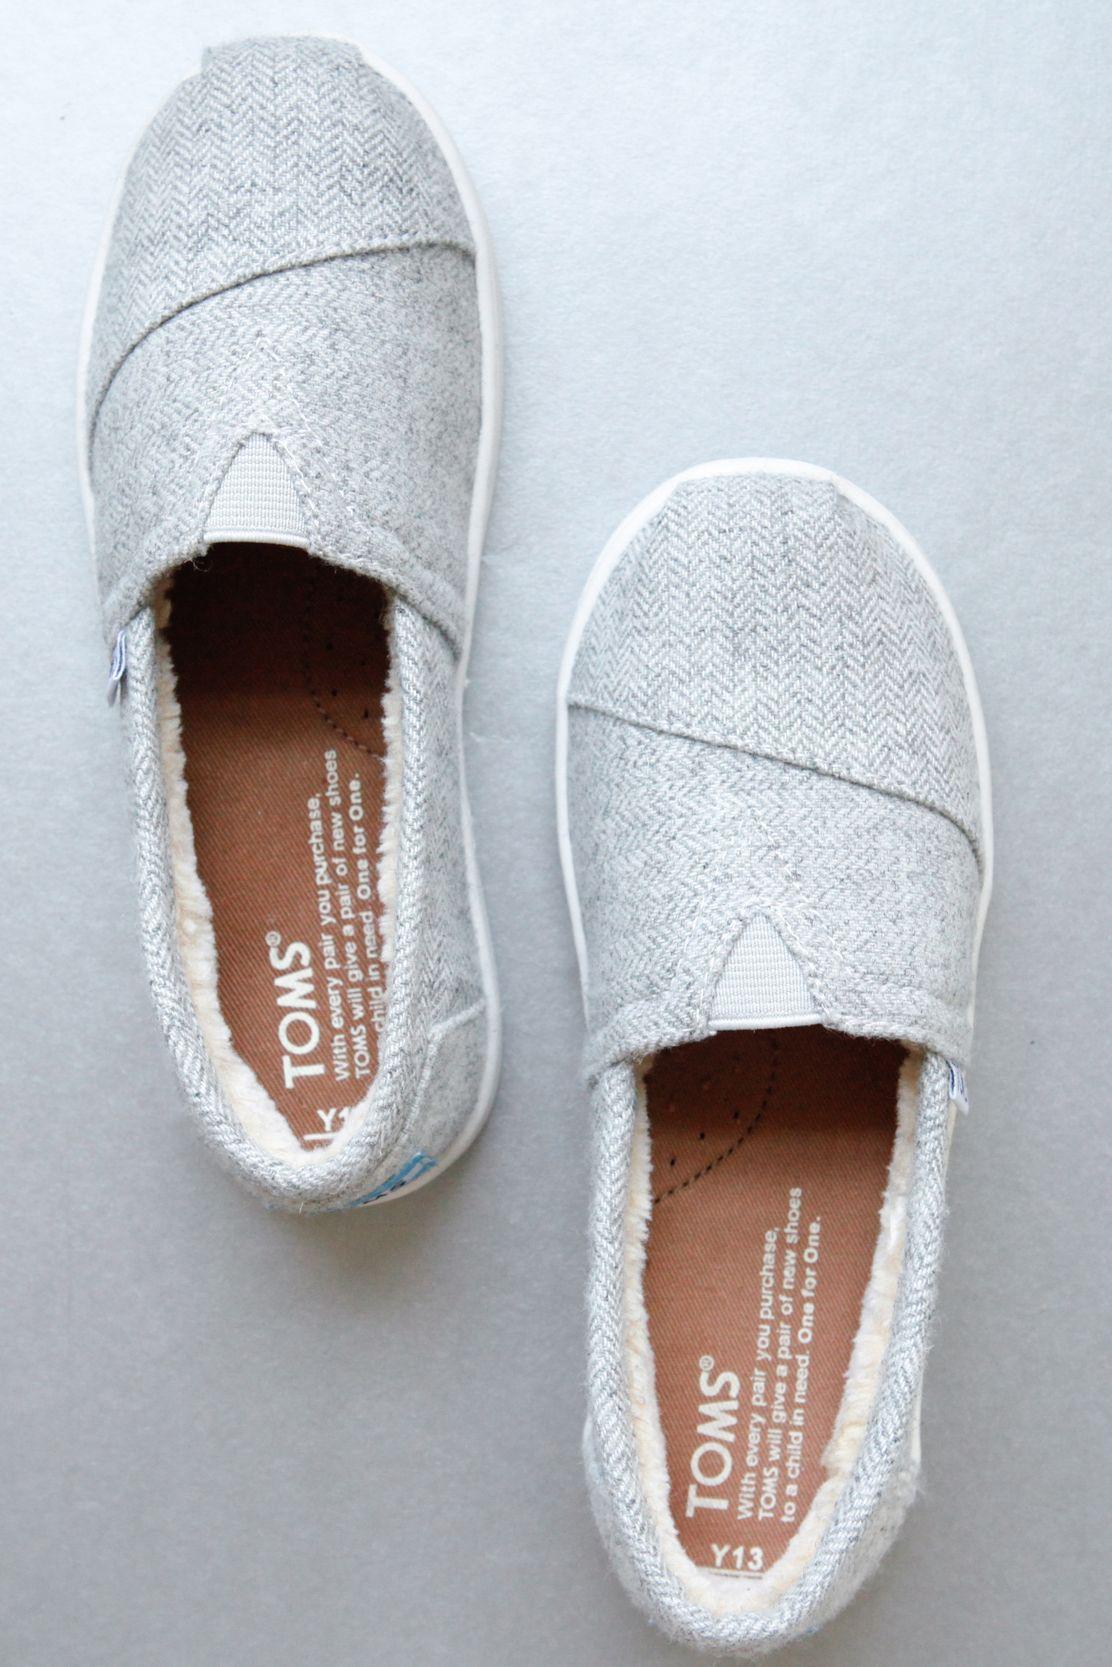 grey herringbone TOMS Slip-Ons for kids